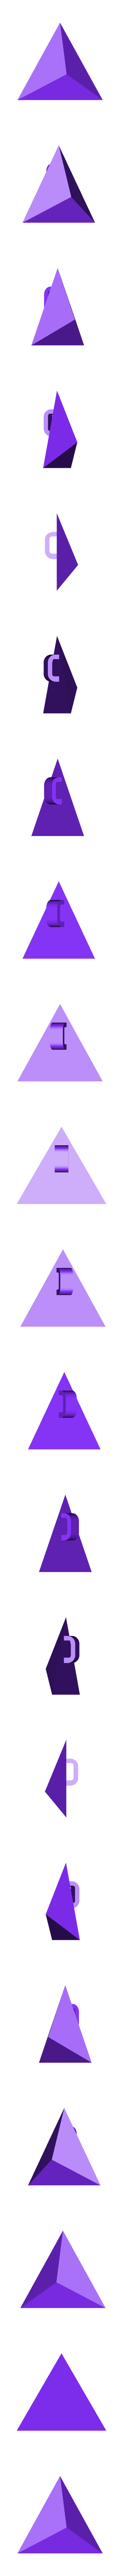 S Triangle Key Chain.stl Download free STL file Triangle Key chain • 3D printable object, jasonwarsalla